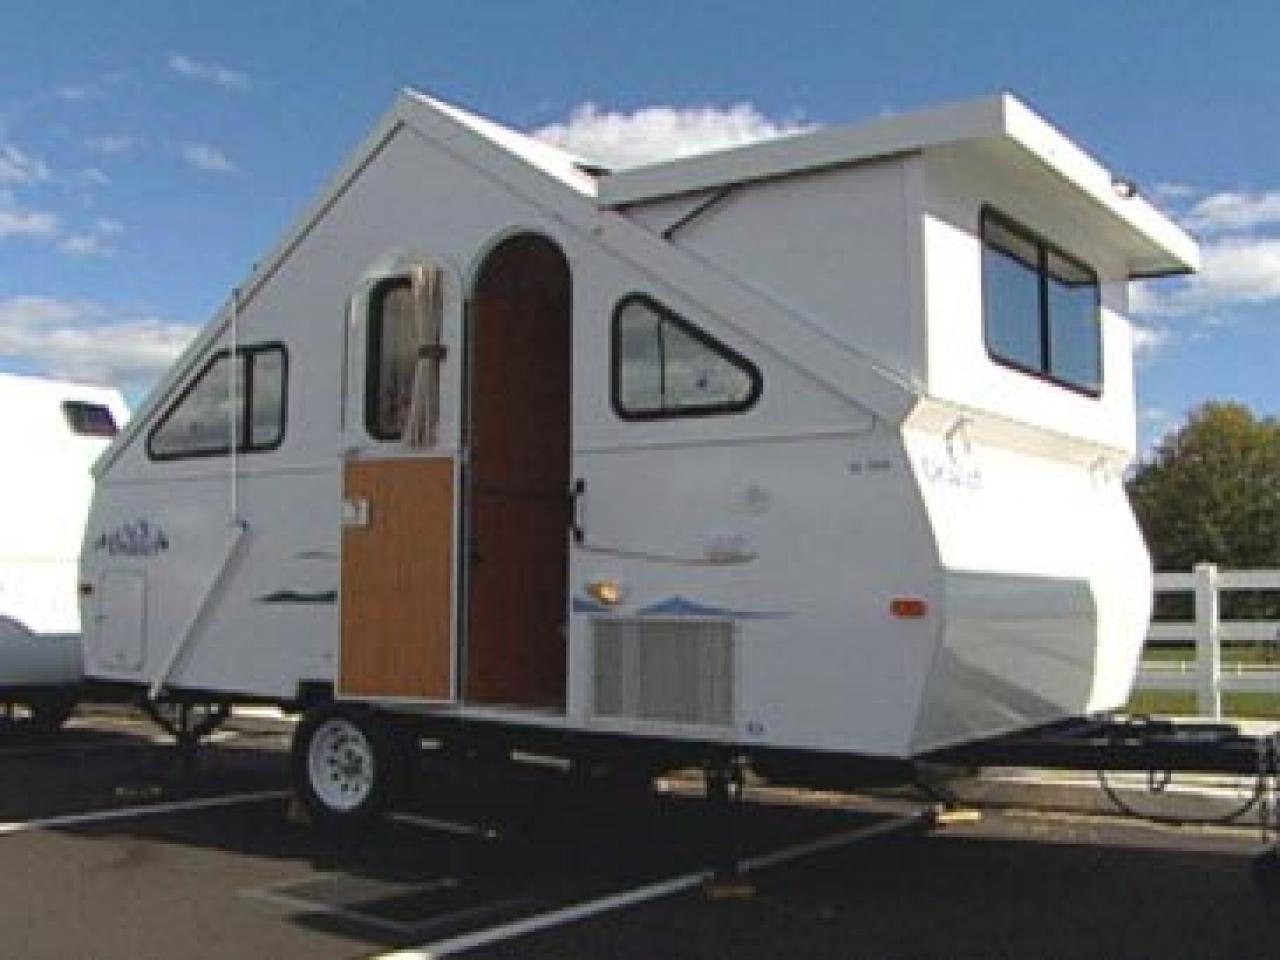 Towable Folding Camping Trailer